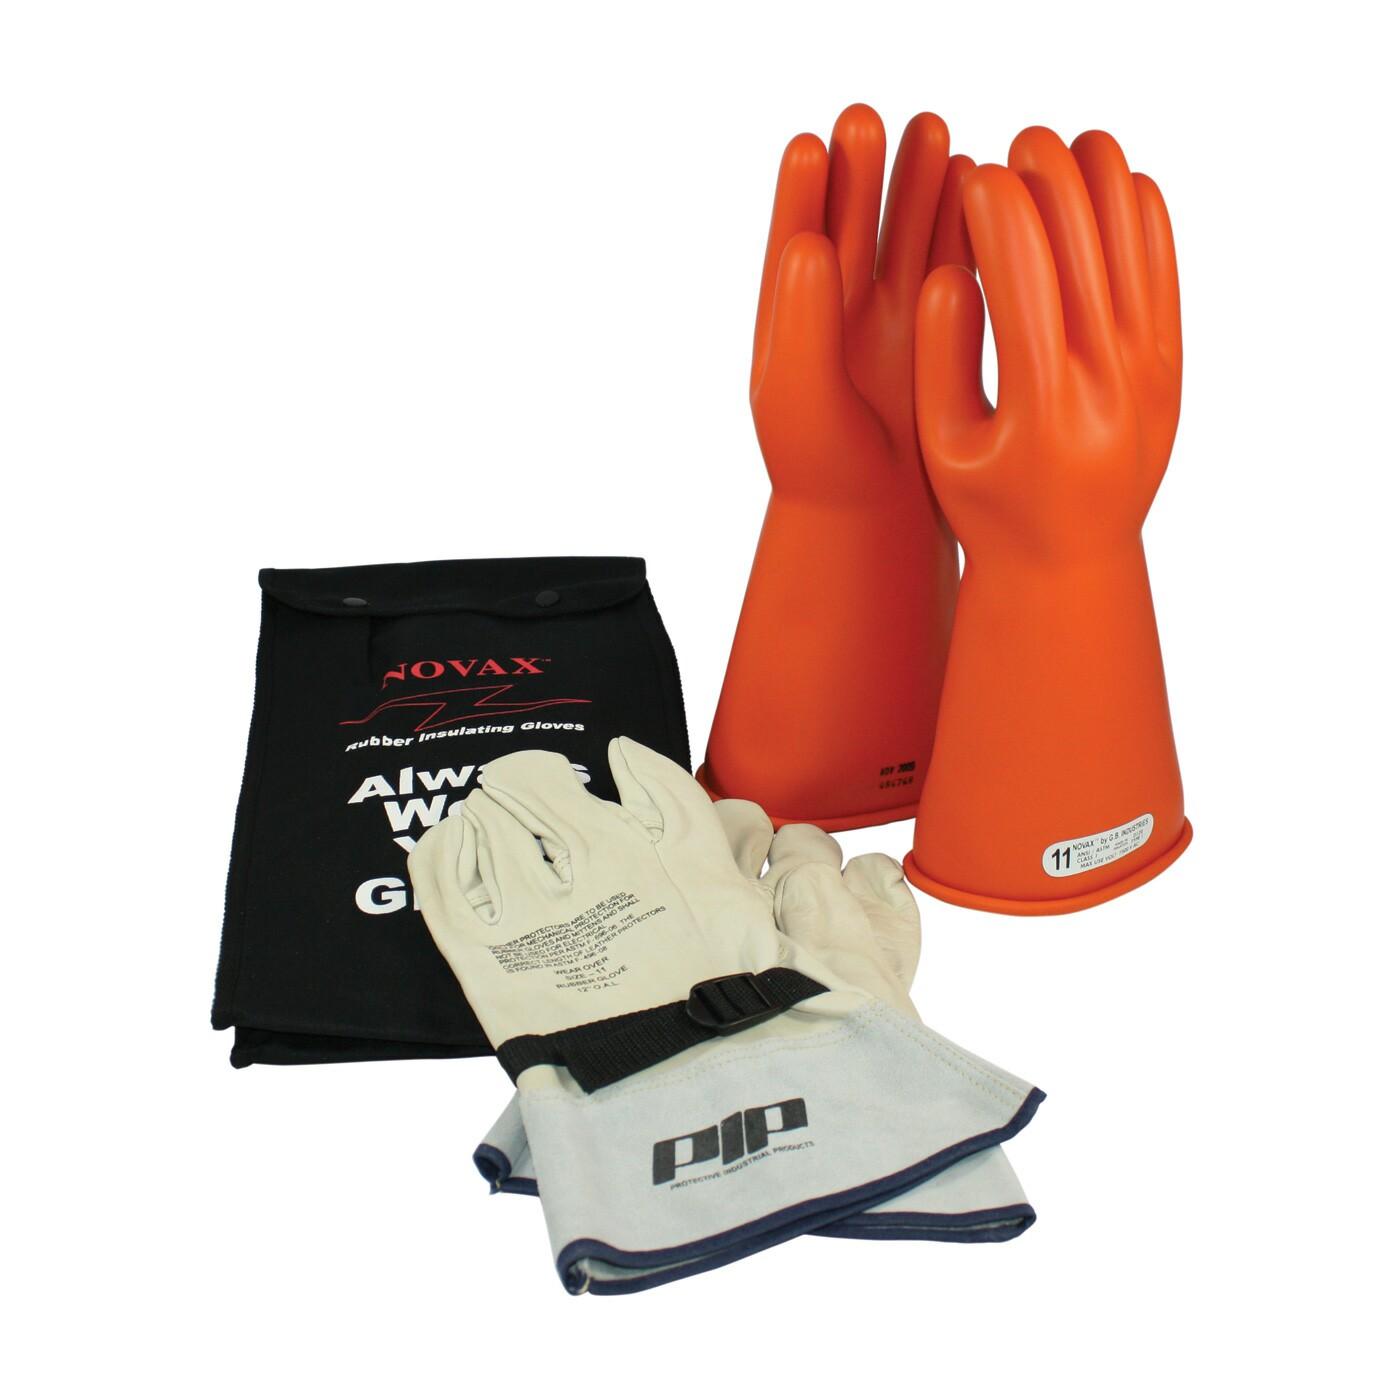 Novax Electrical Safety Glove Kit Orange Class 1